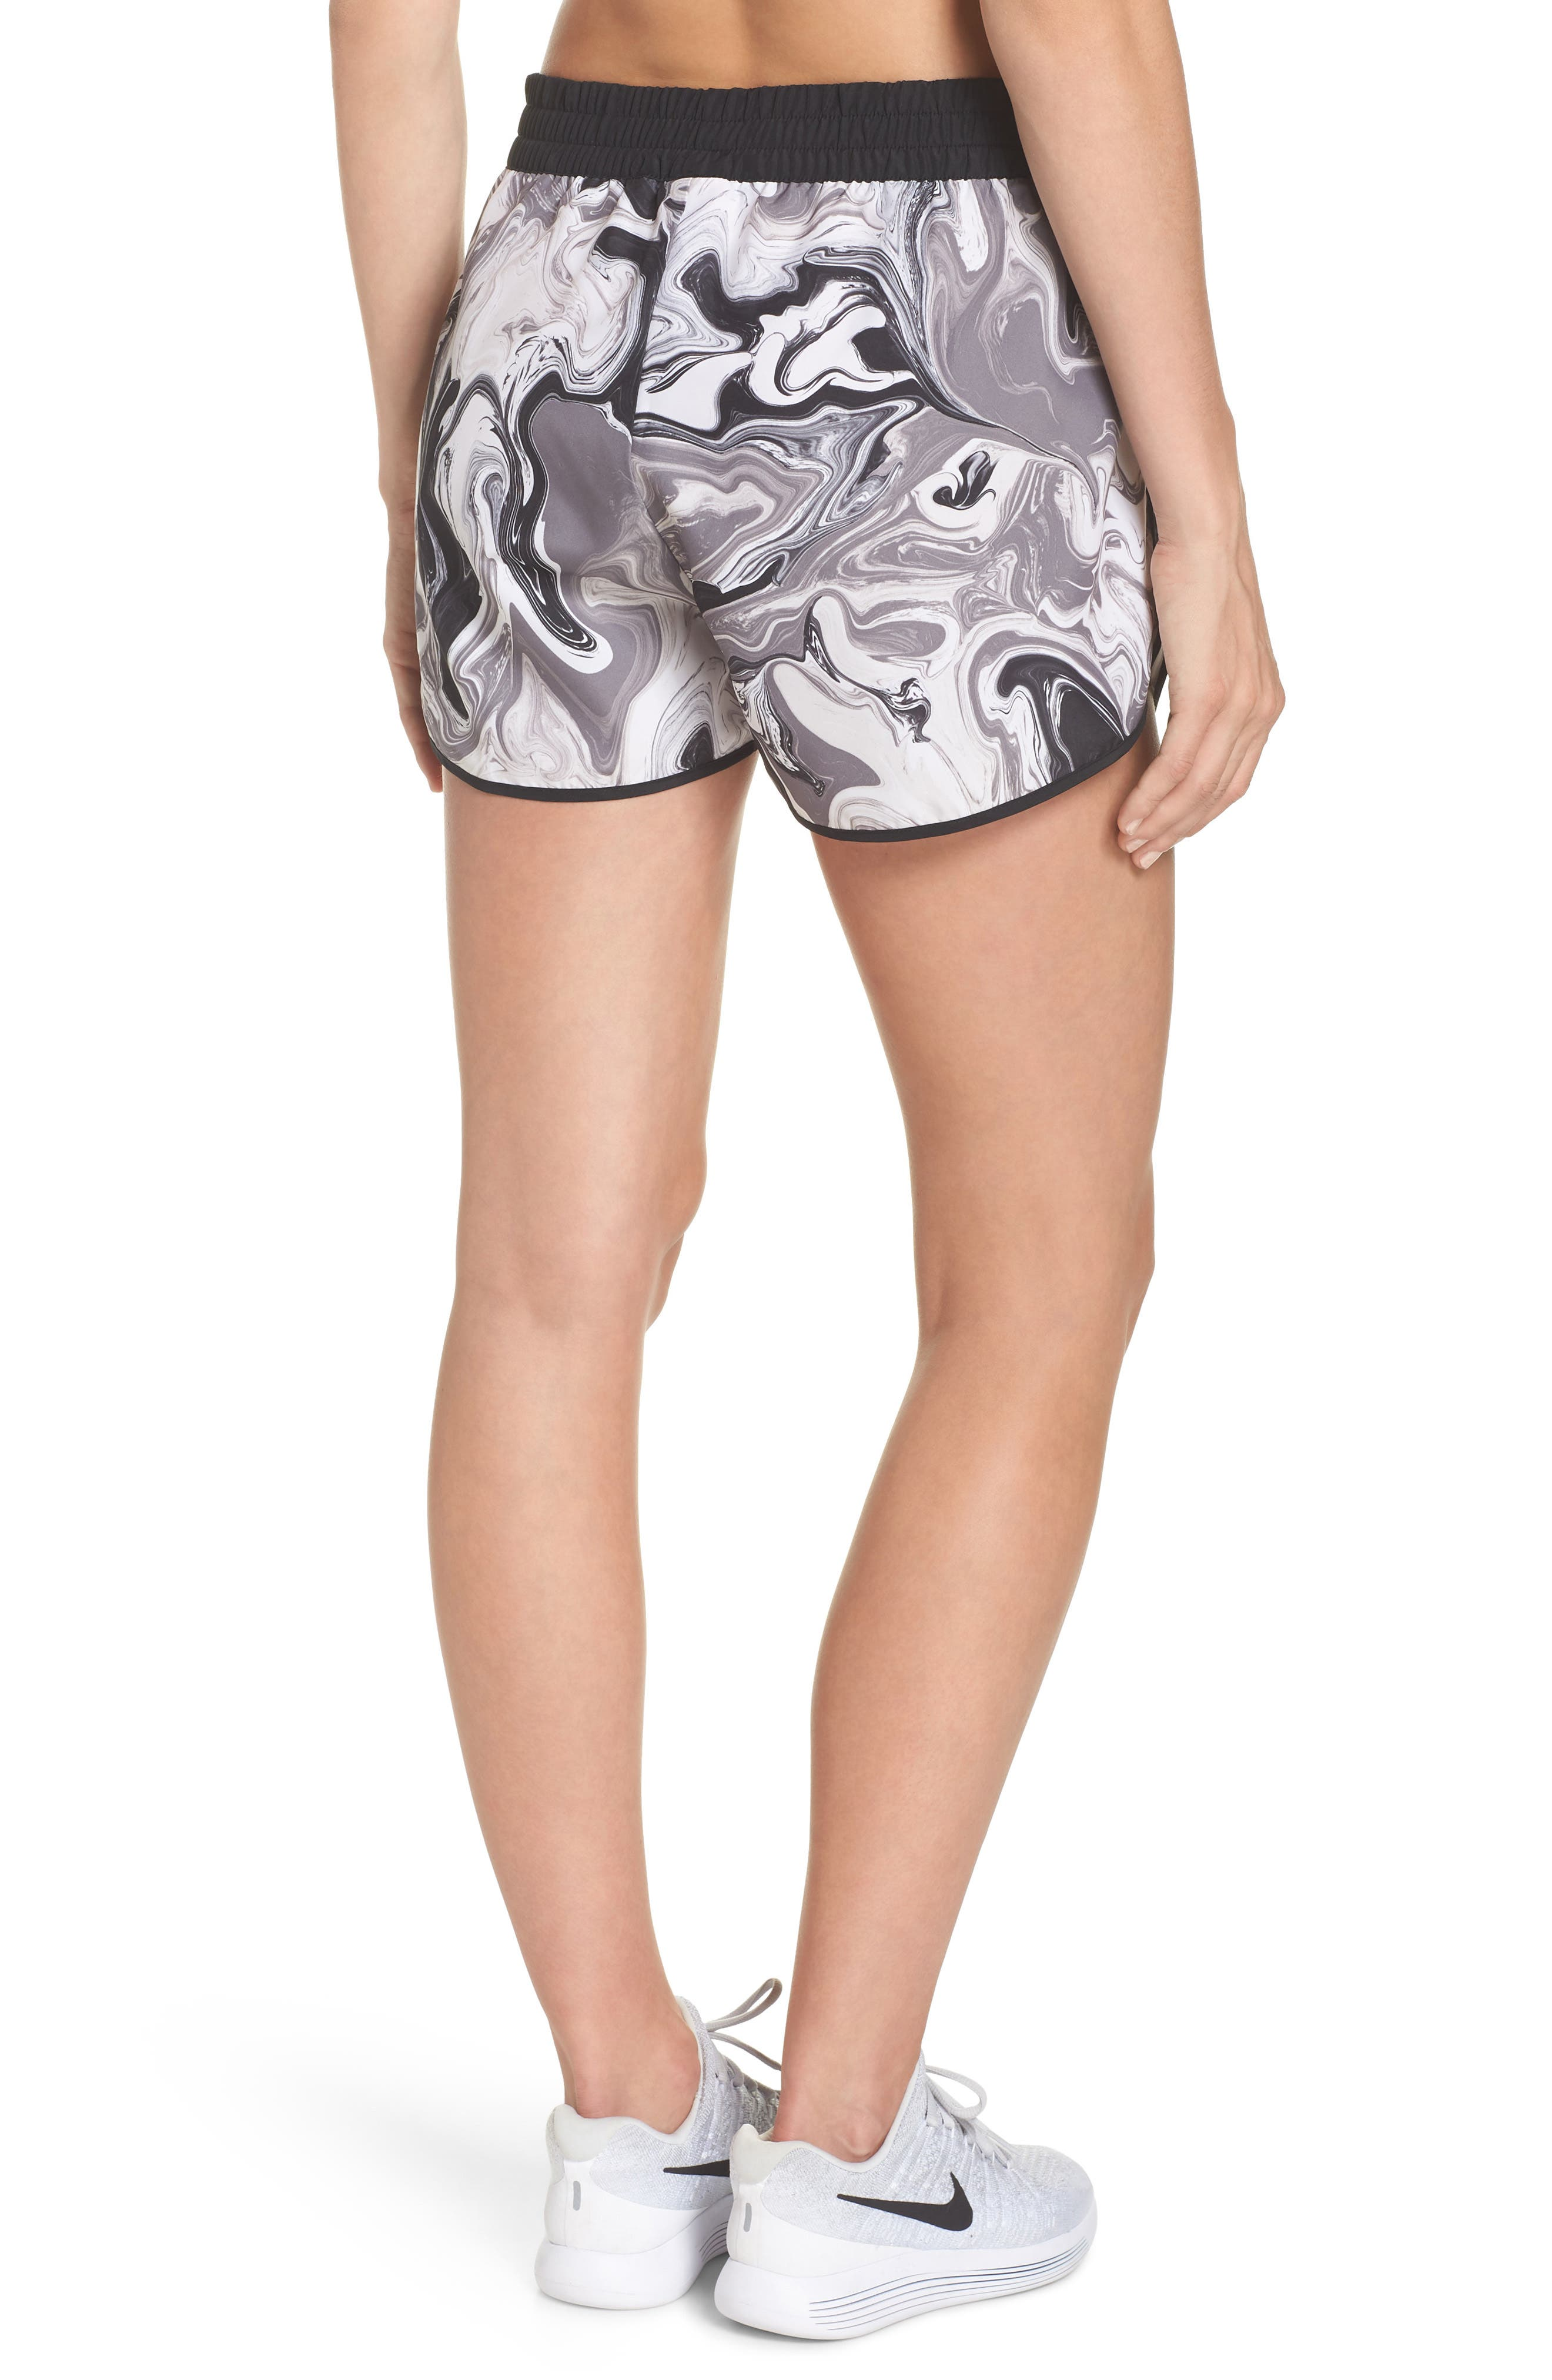 Sportswear Women's Shorts,                             Alternate thumbnail 4, color,                             036